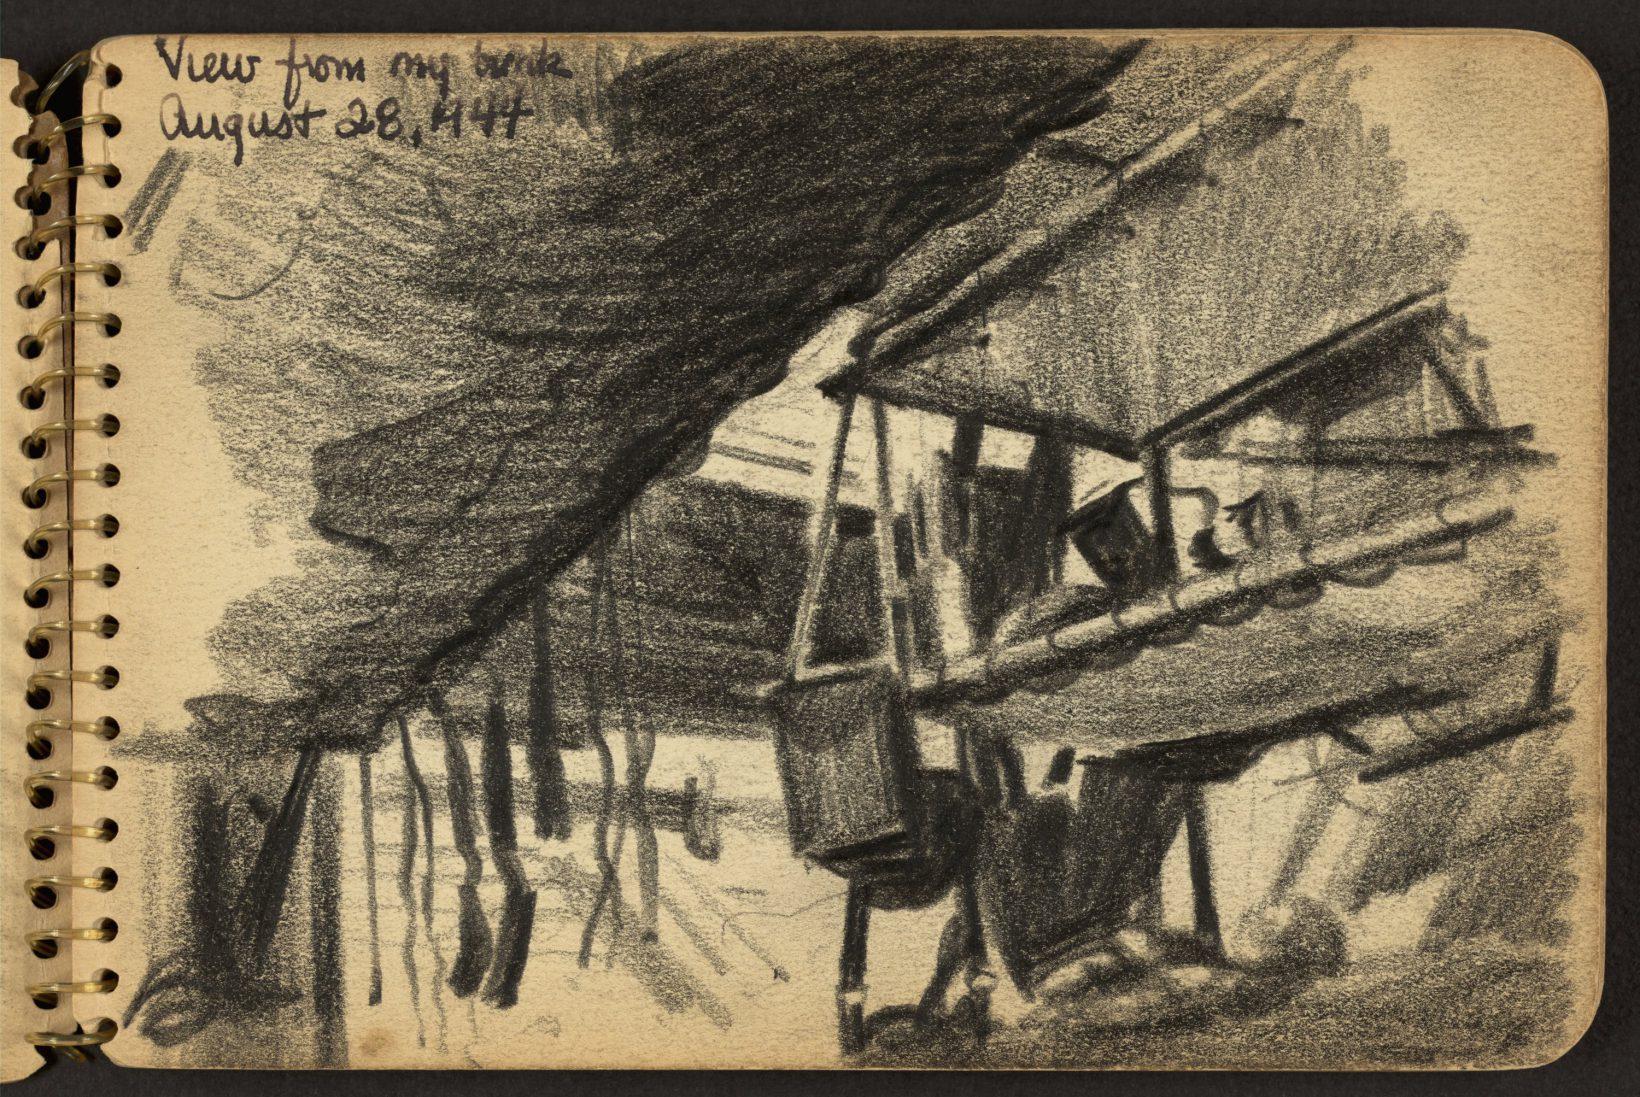 victor-lundy-carnet-croquis-seconde-guerre-mondiale-34